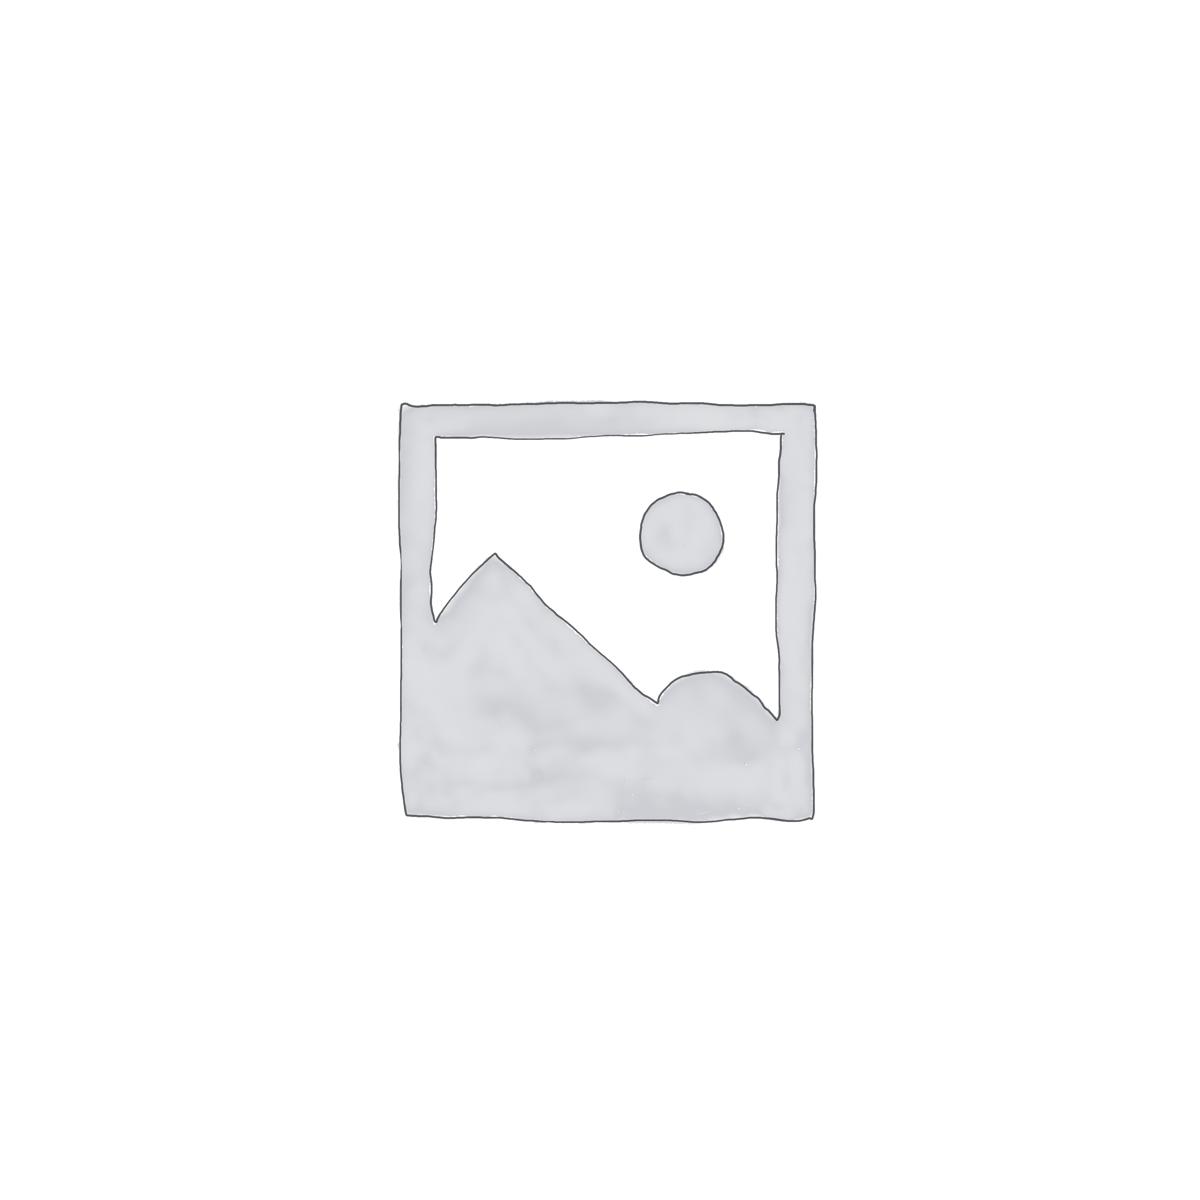 London Charcoal Drawing City Wallpaper Mural